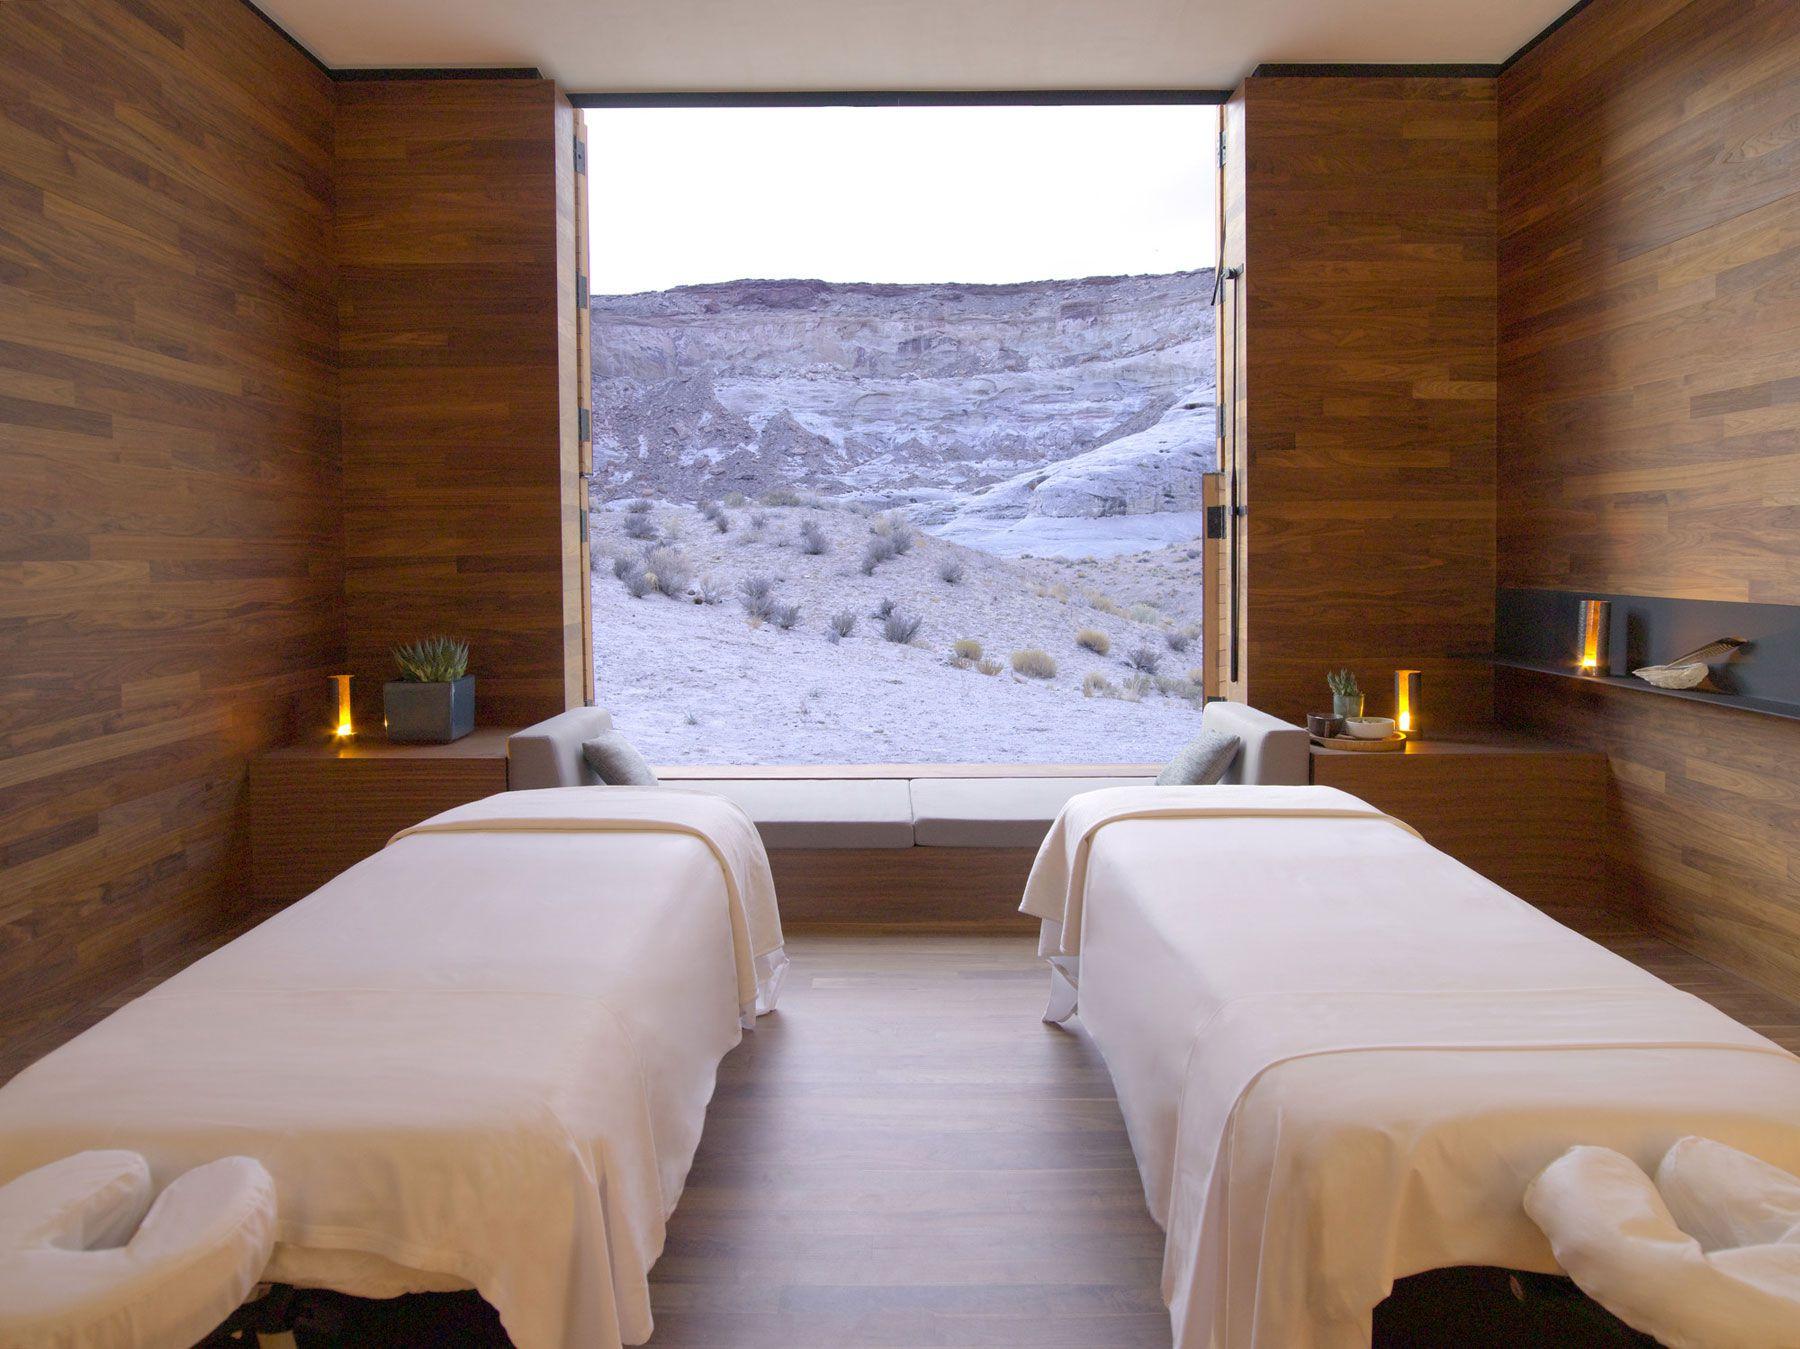 Amangiri-Luxury-Resort-Hotel-in-Canyon-Point-17